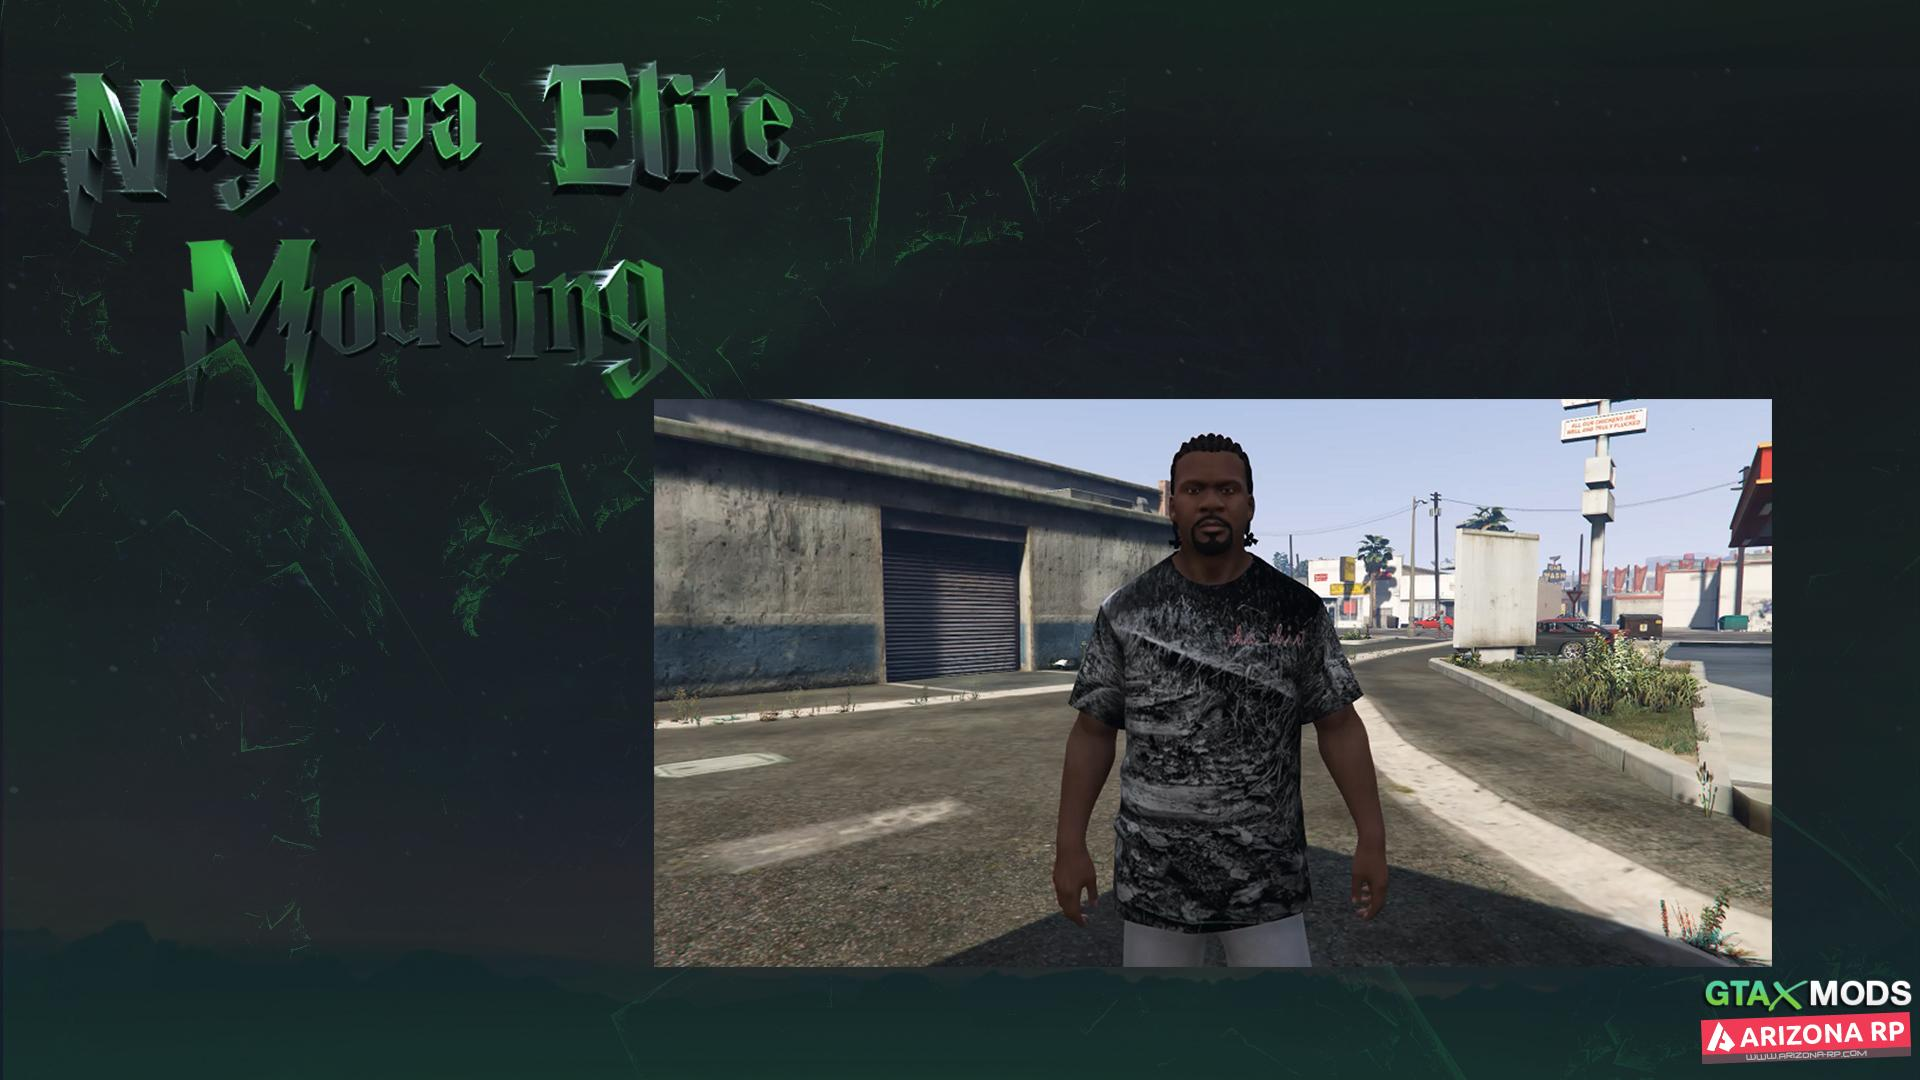 Пешеход лля GTA 5   Nagawa Elite Modding